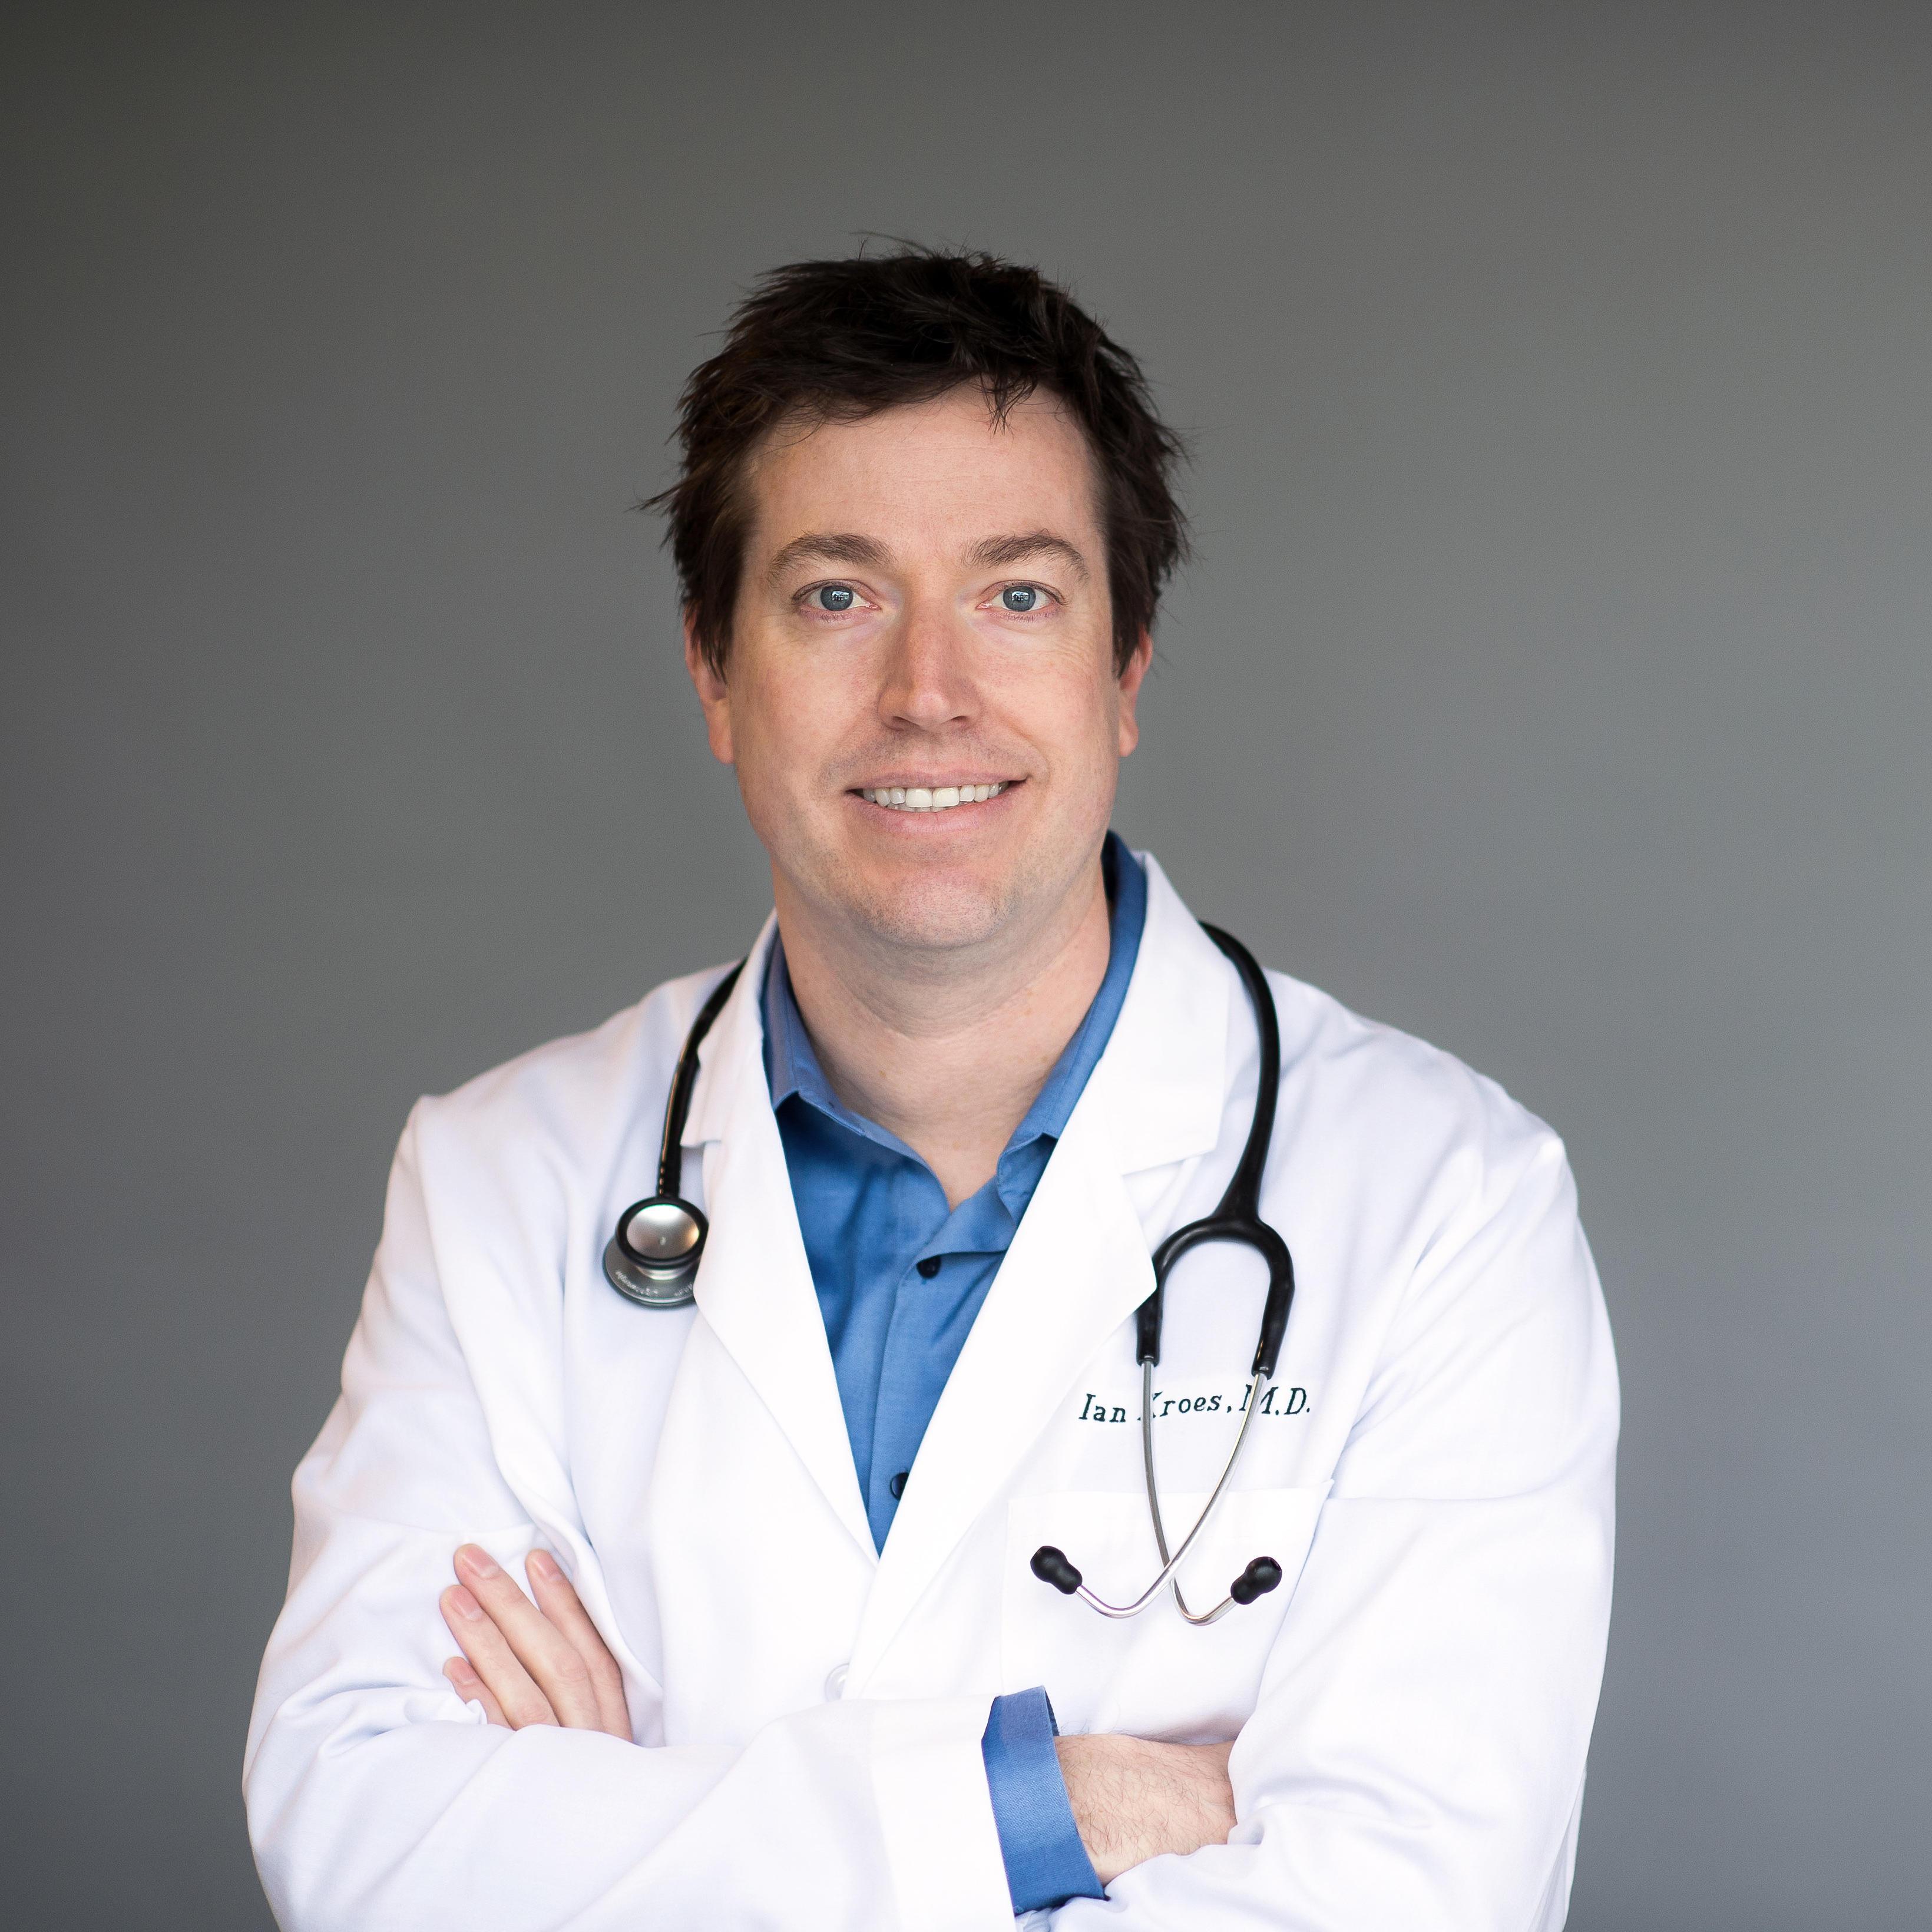 Peninsula Doctor Primary Care Concierge Medicine At 401 Burgess Dr Ste D Menlo Park Ca On Fave